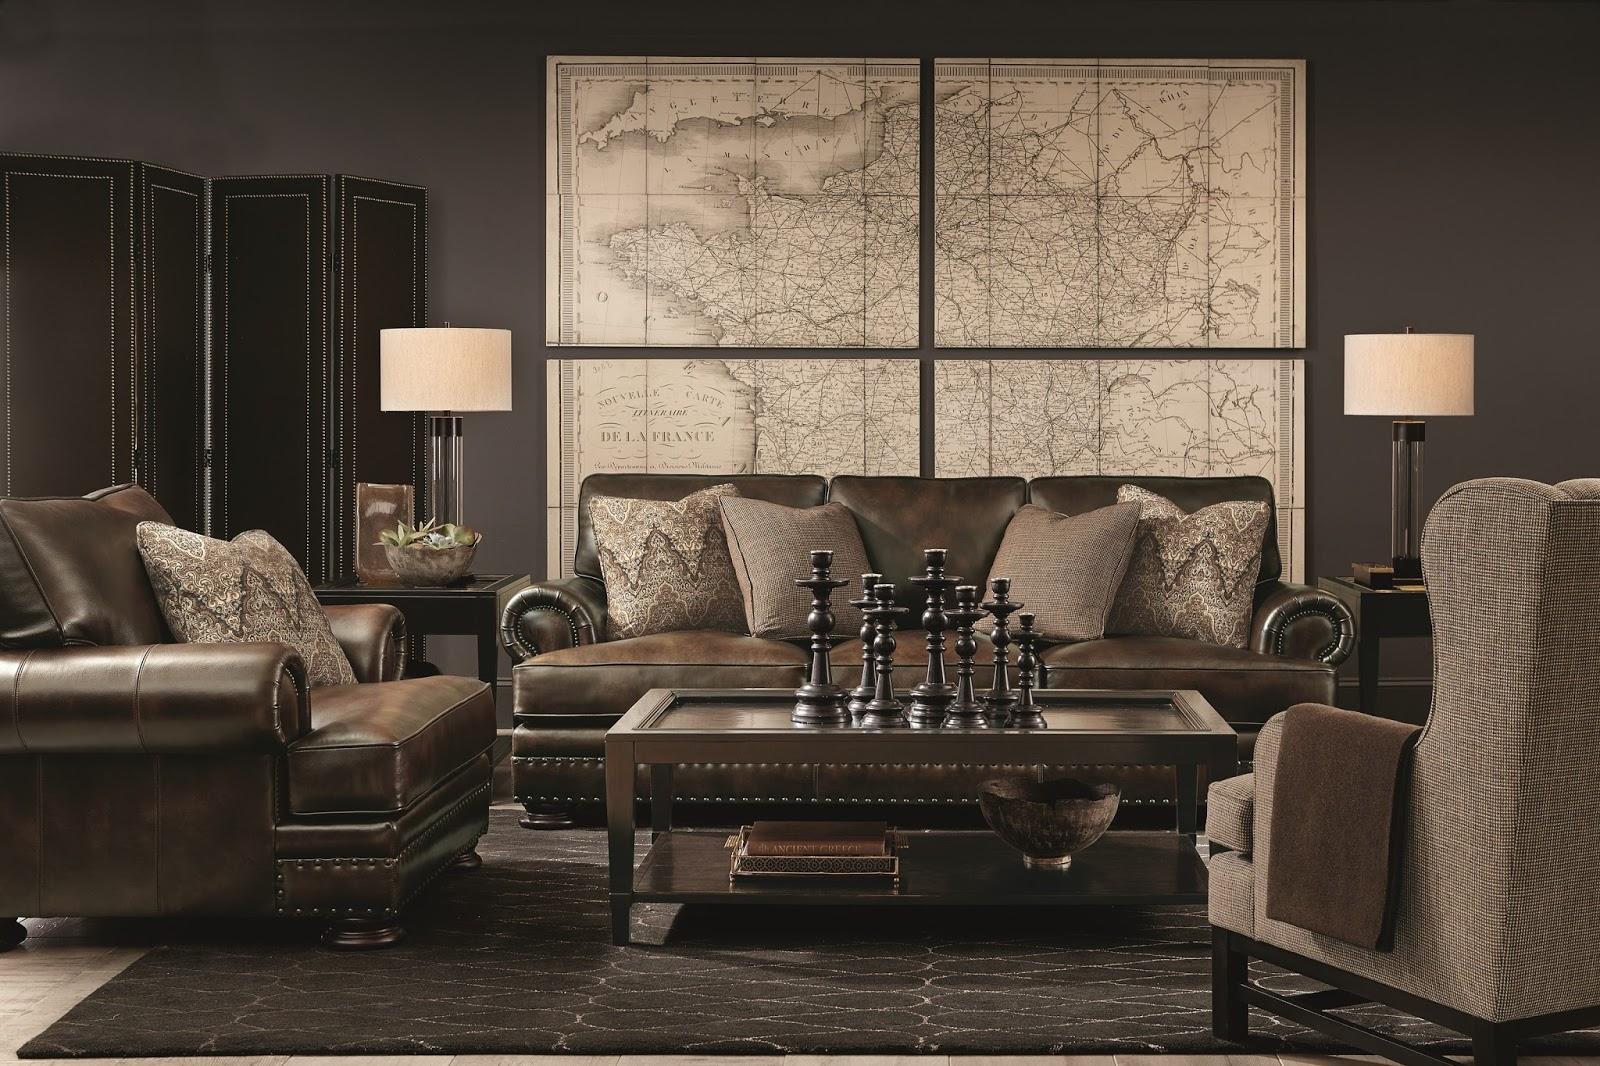 Bernhardt Leather Couch At Baeru0027s Furniture Store